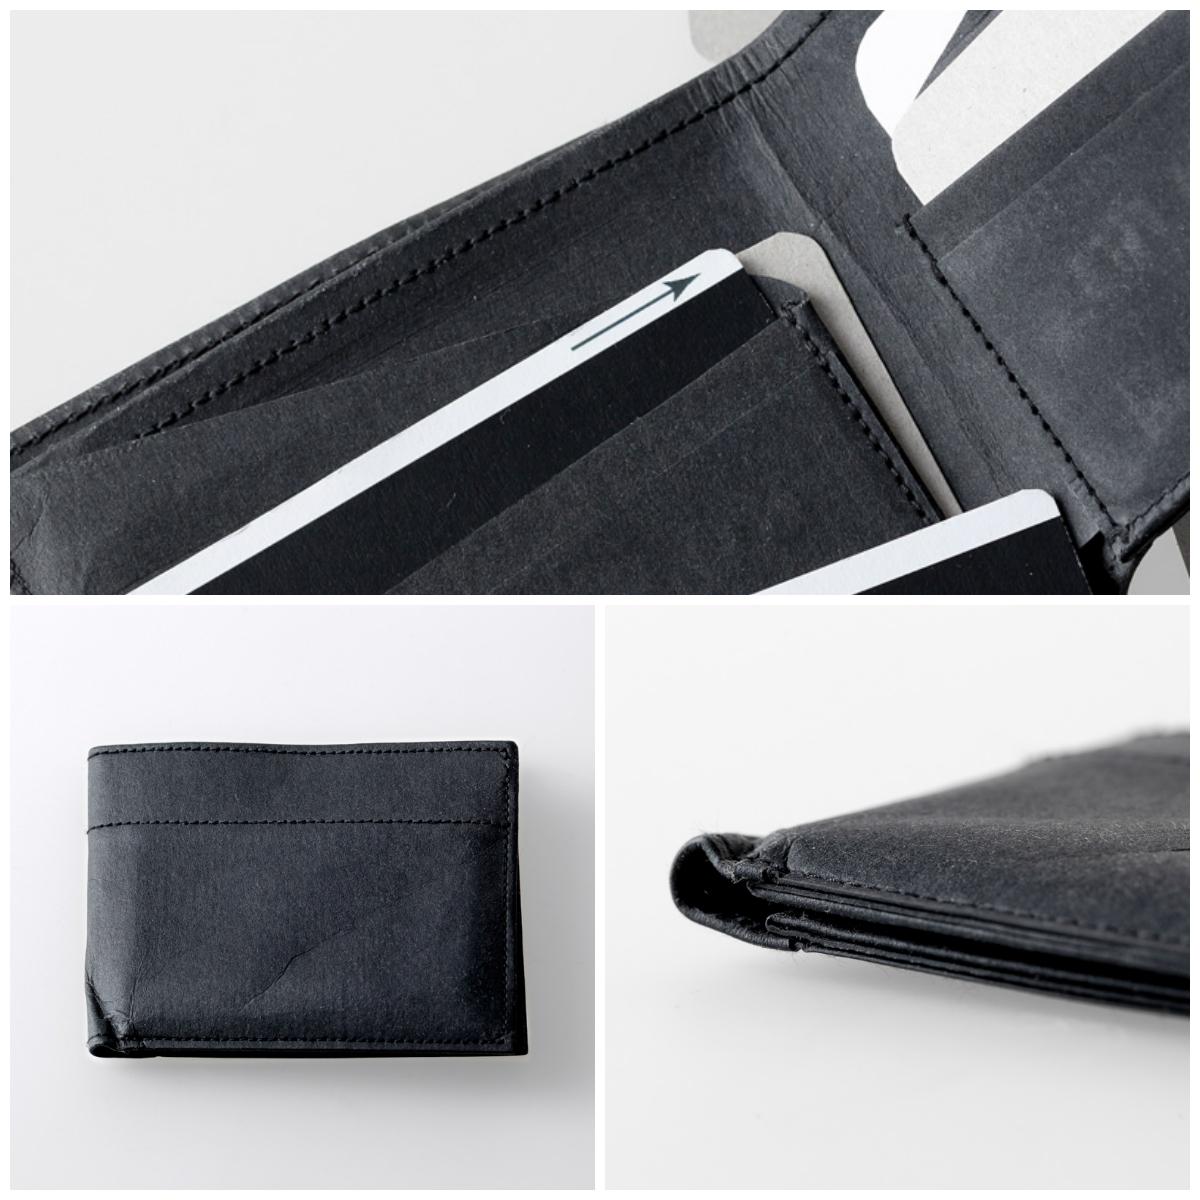 One-year-old washable paper wallet - SIDONIEYANG 使用一年後的可水洗 紙短夾 - 紙樣手創設計